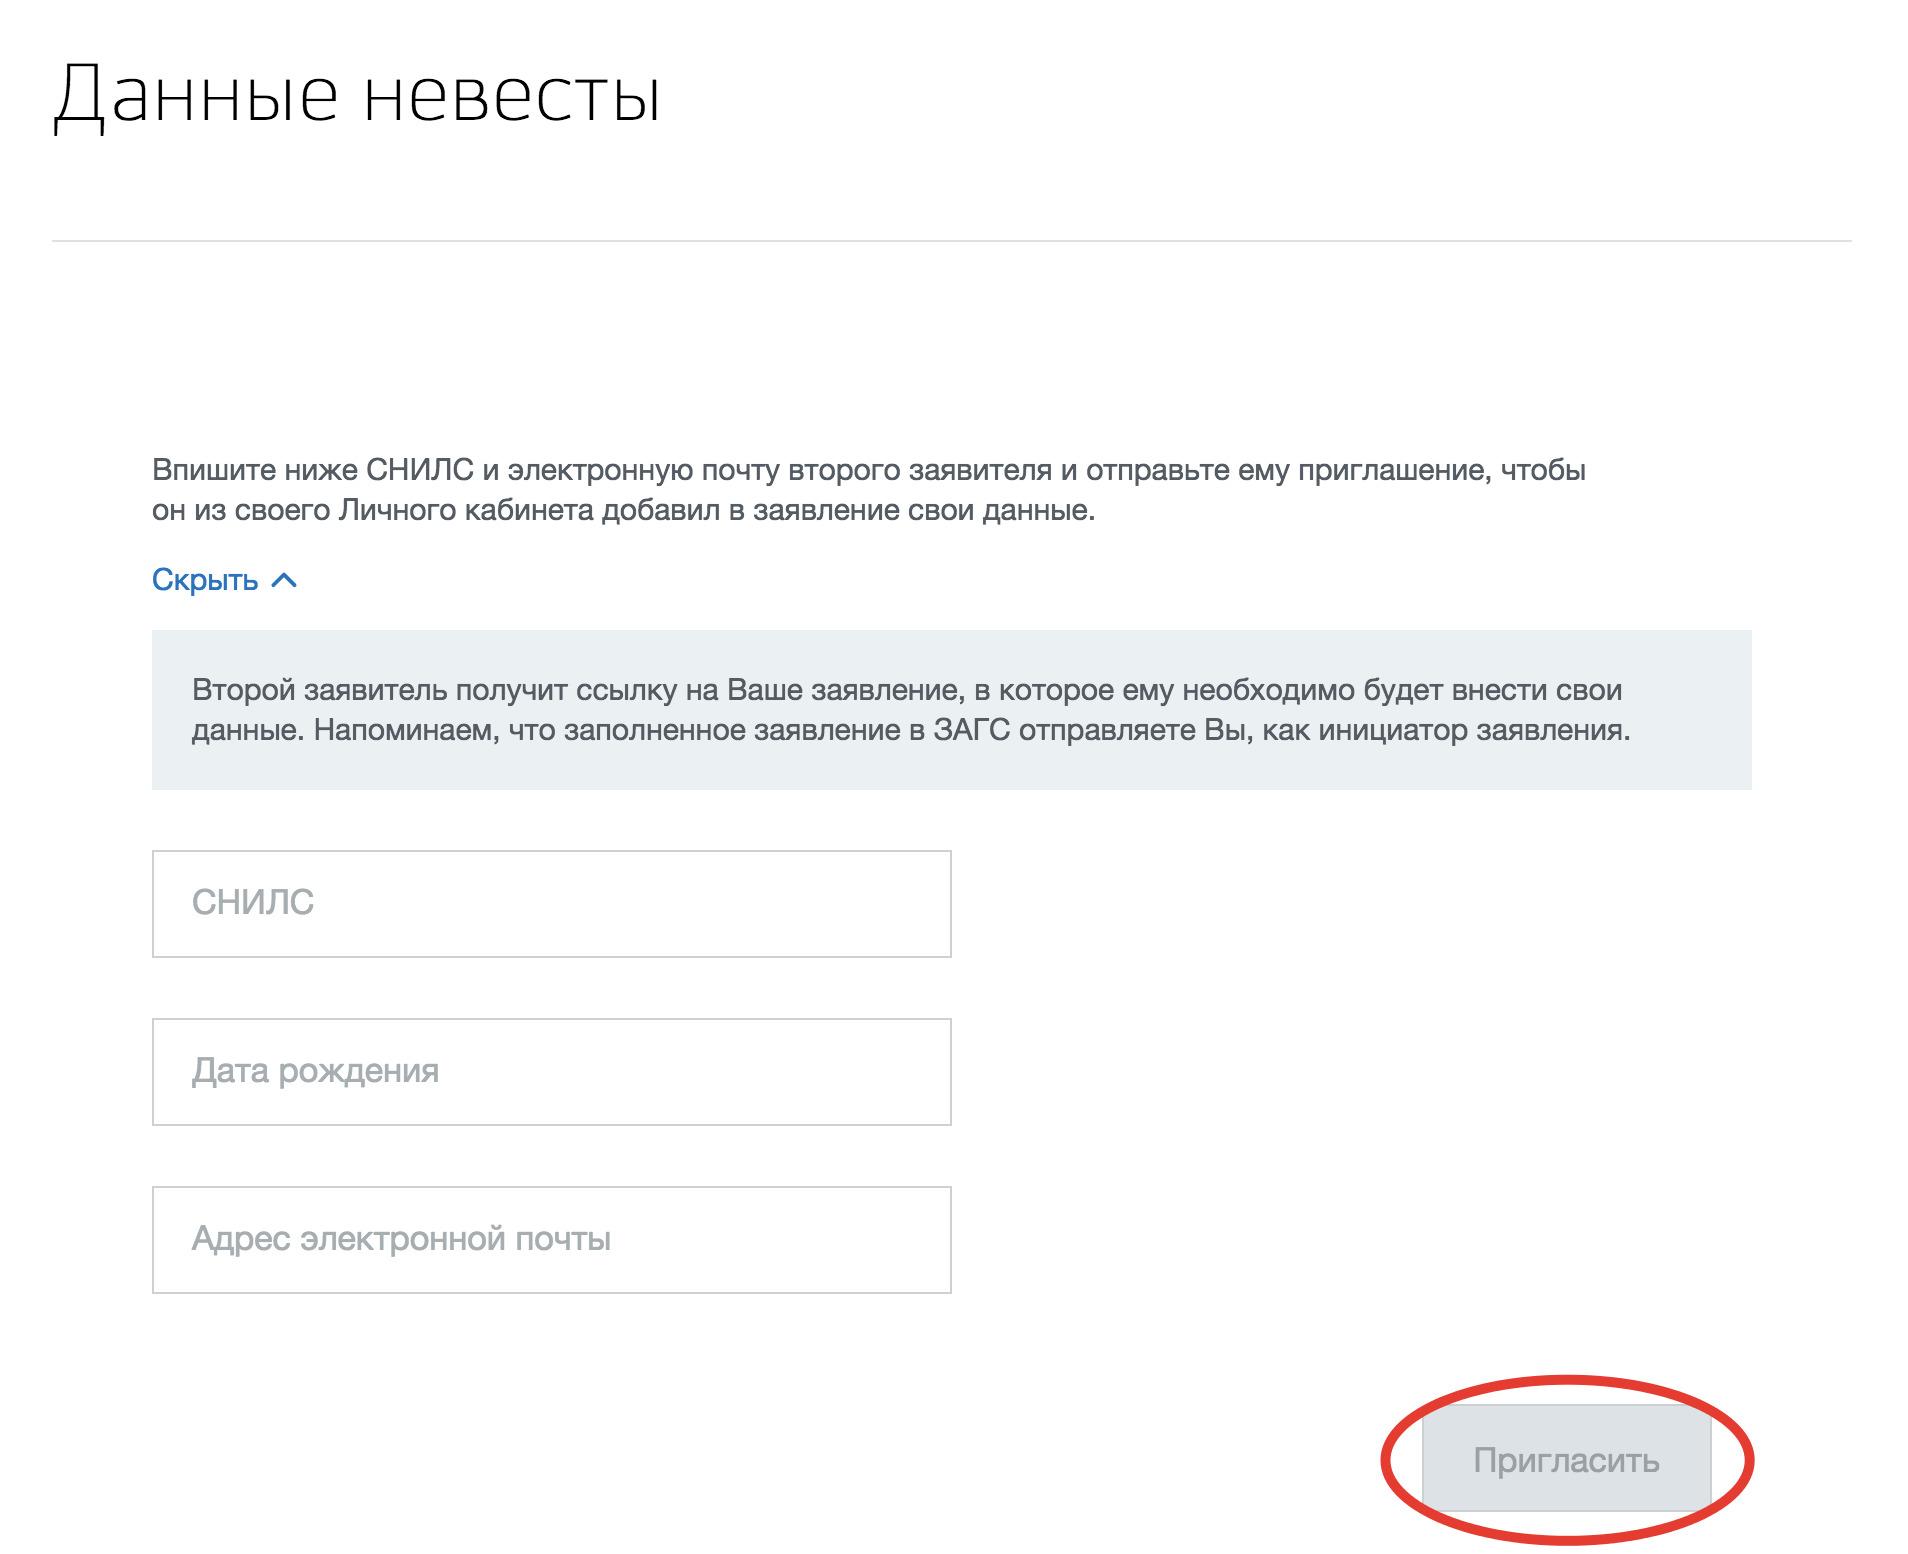 Инструкция по подаче заявления в ЗАГС в режиме онлайн